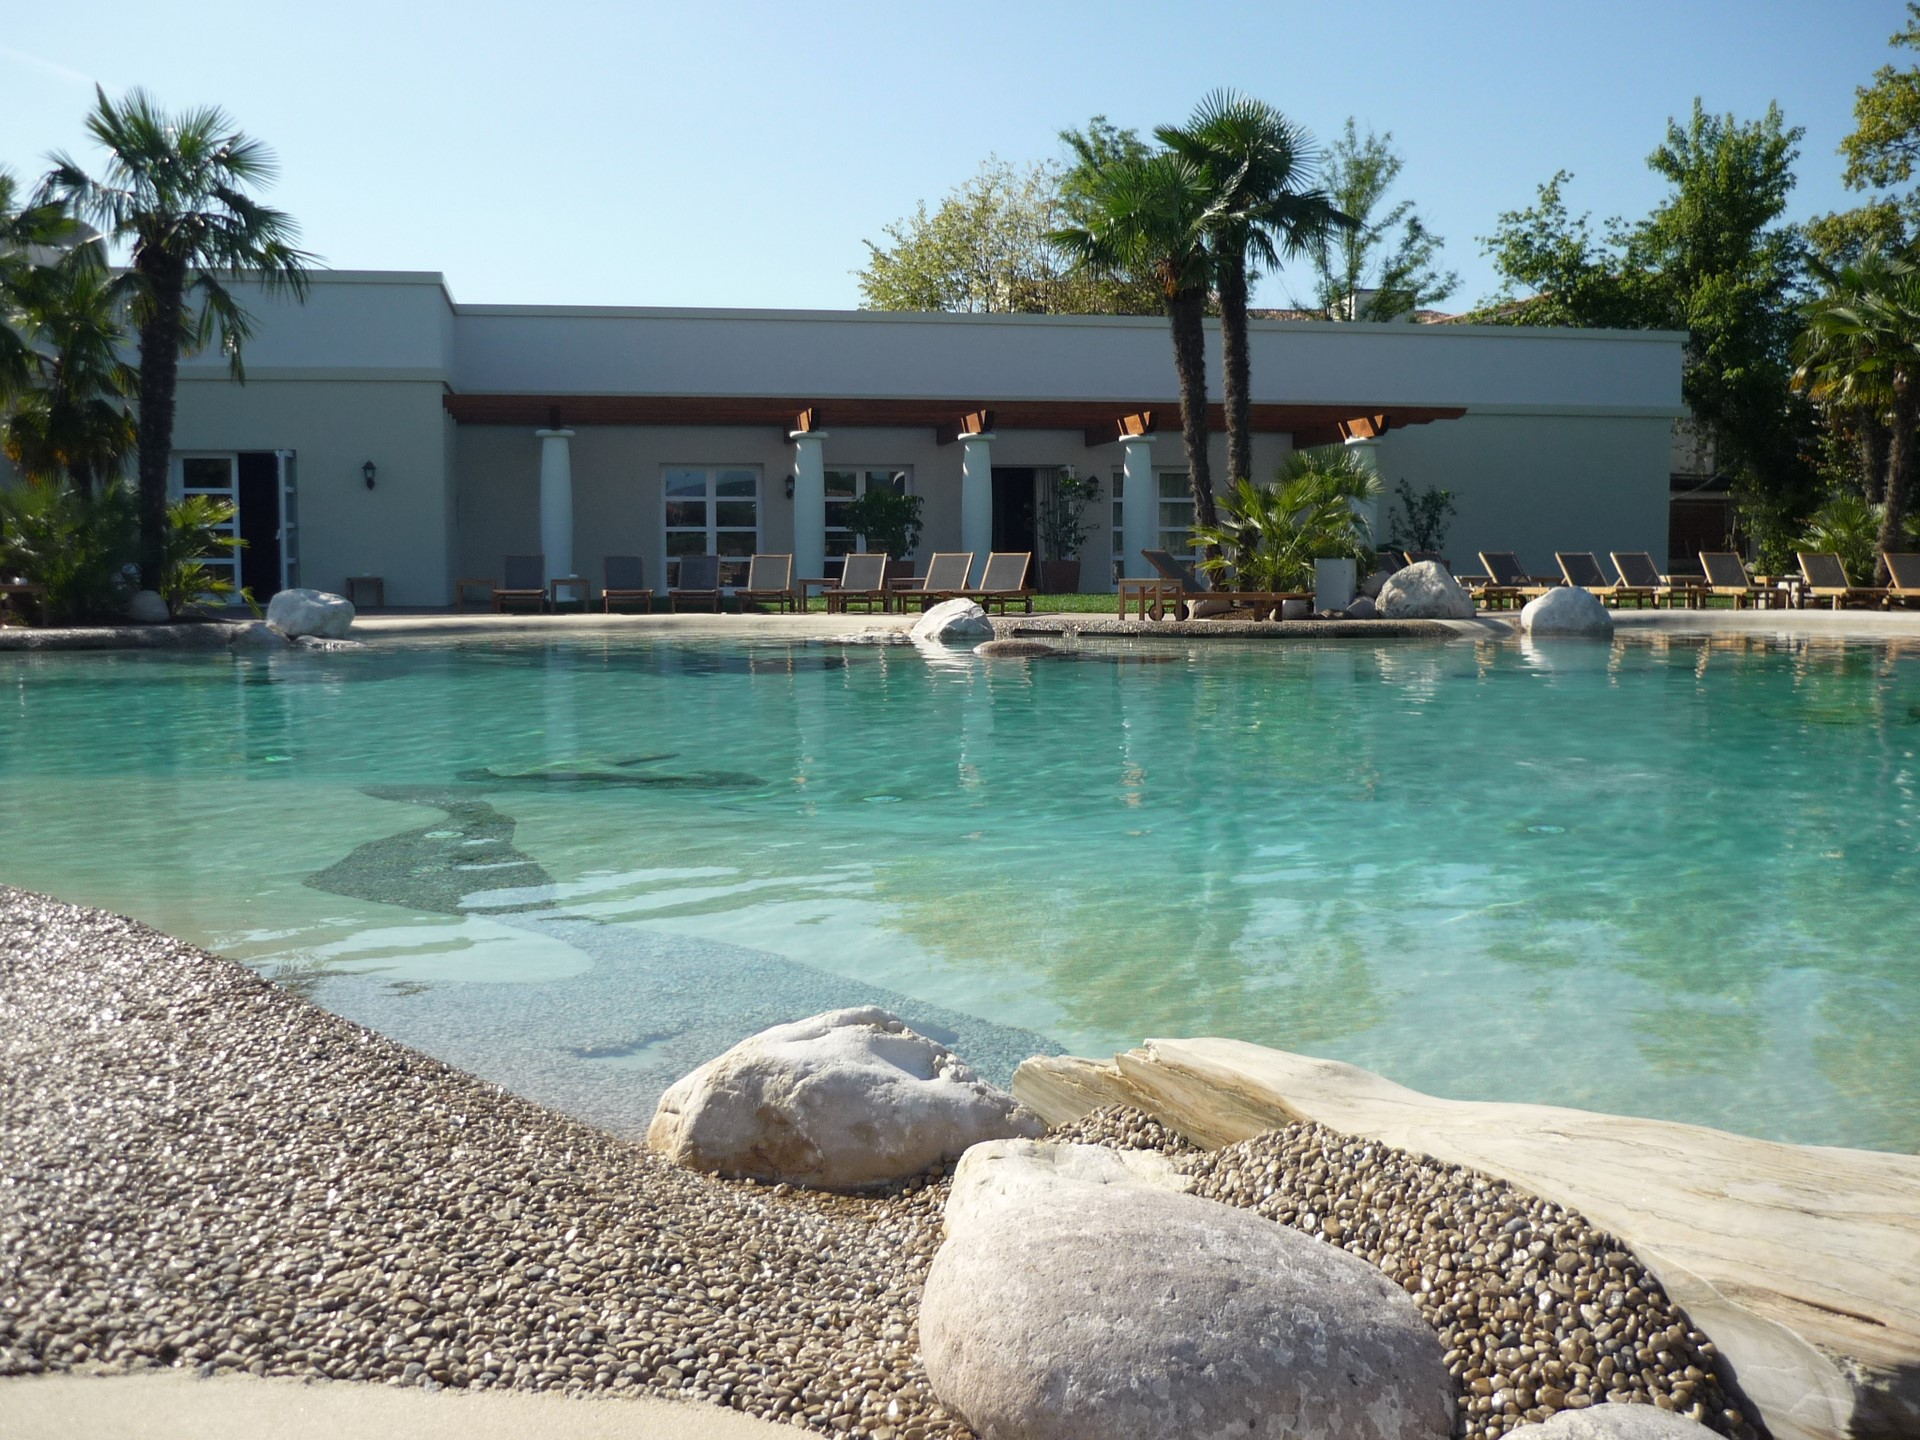 piscina-naturale-biodesign-203